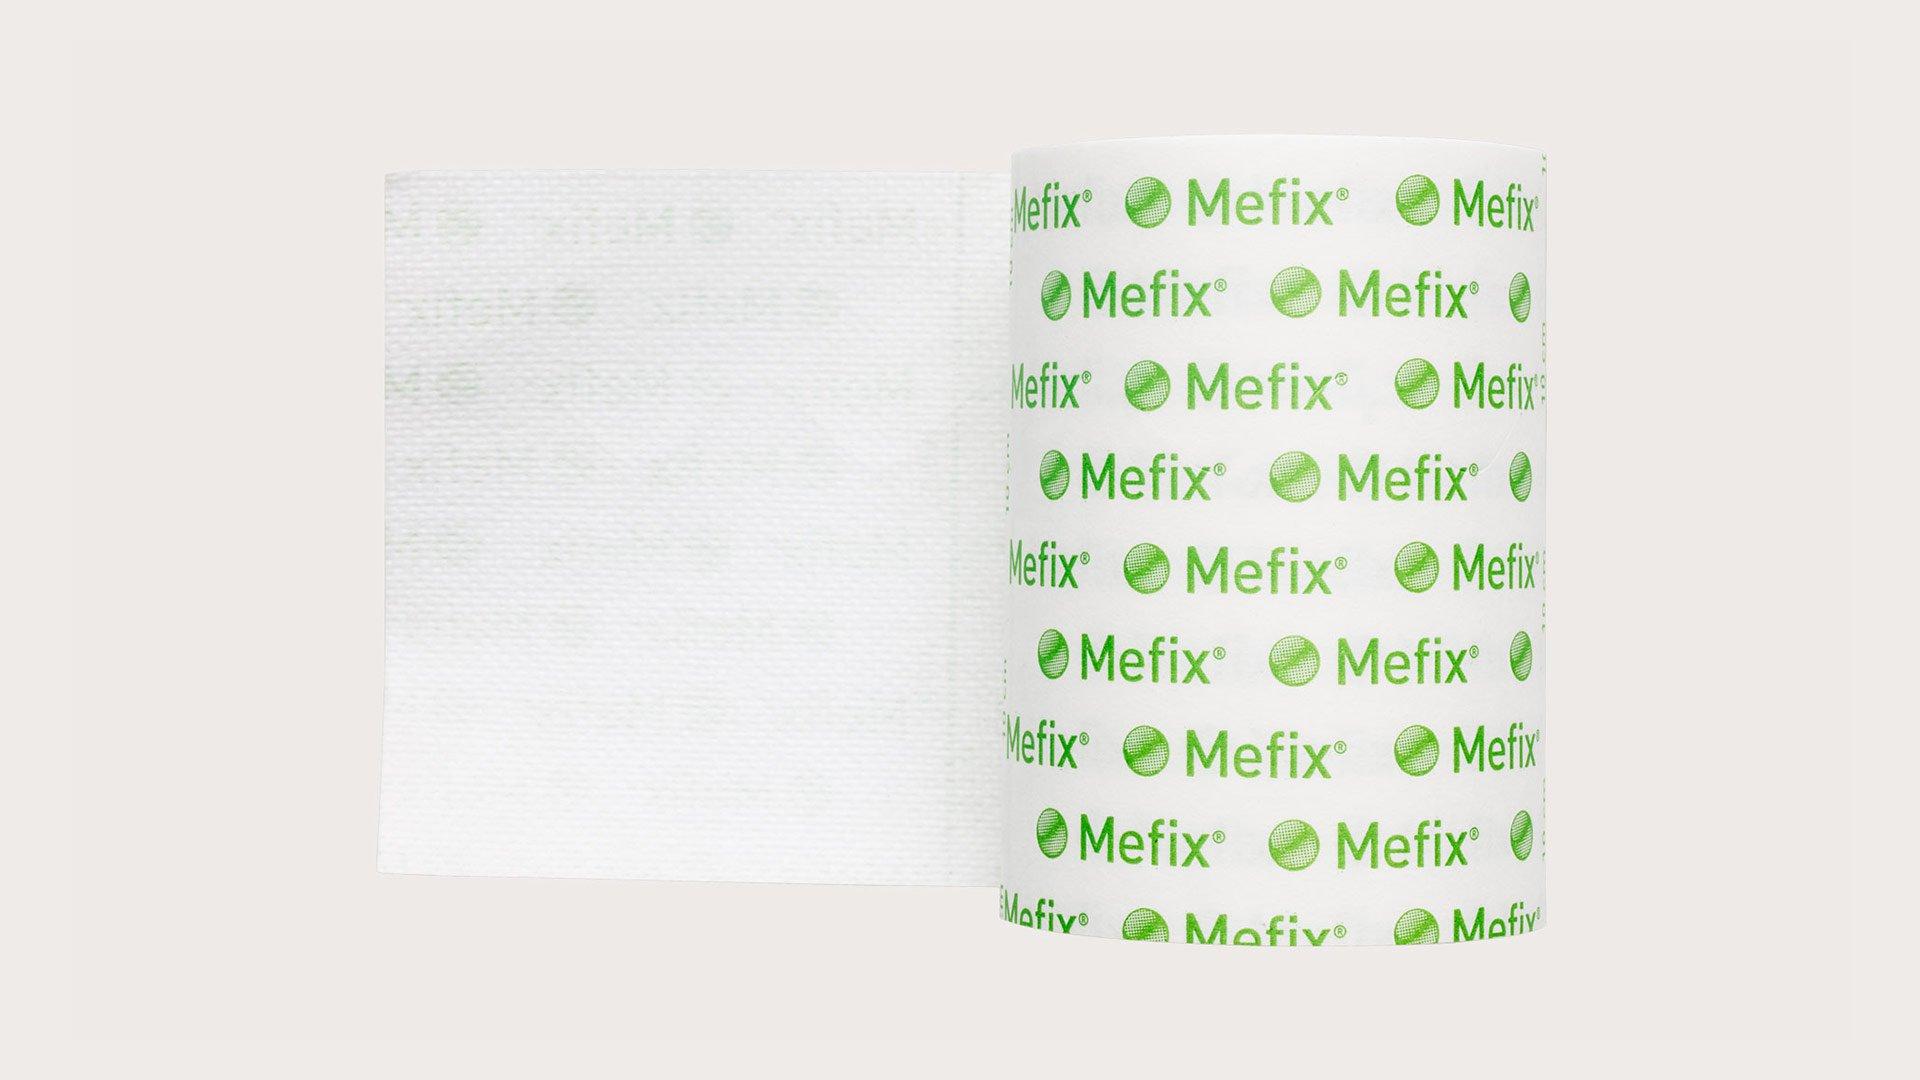 Mefix image cover